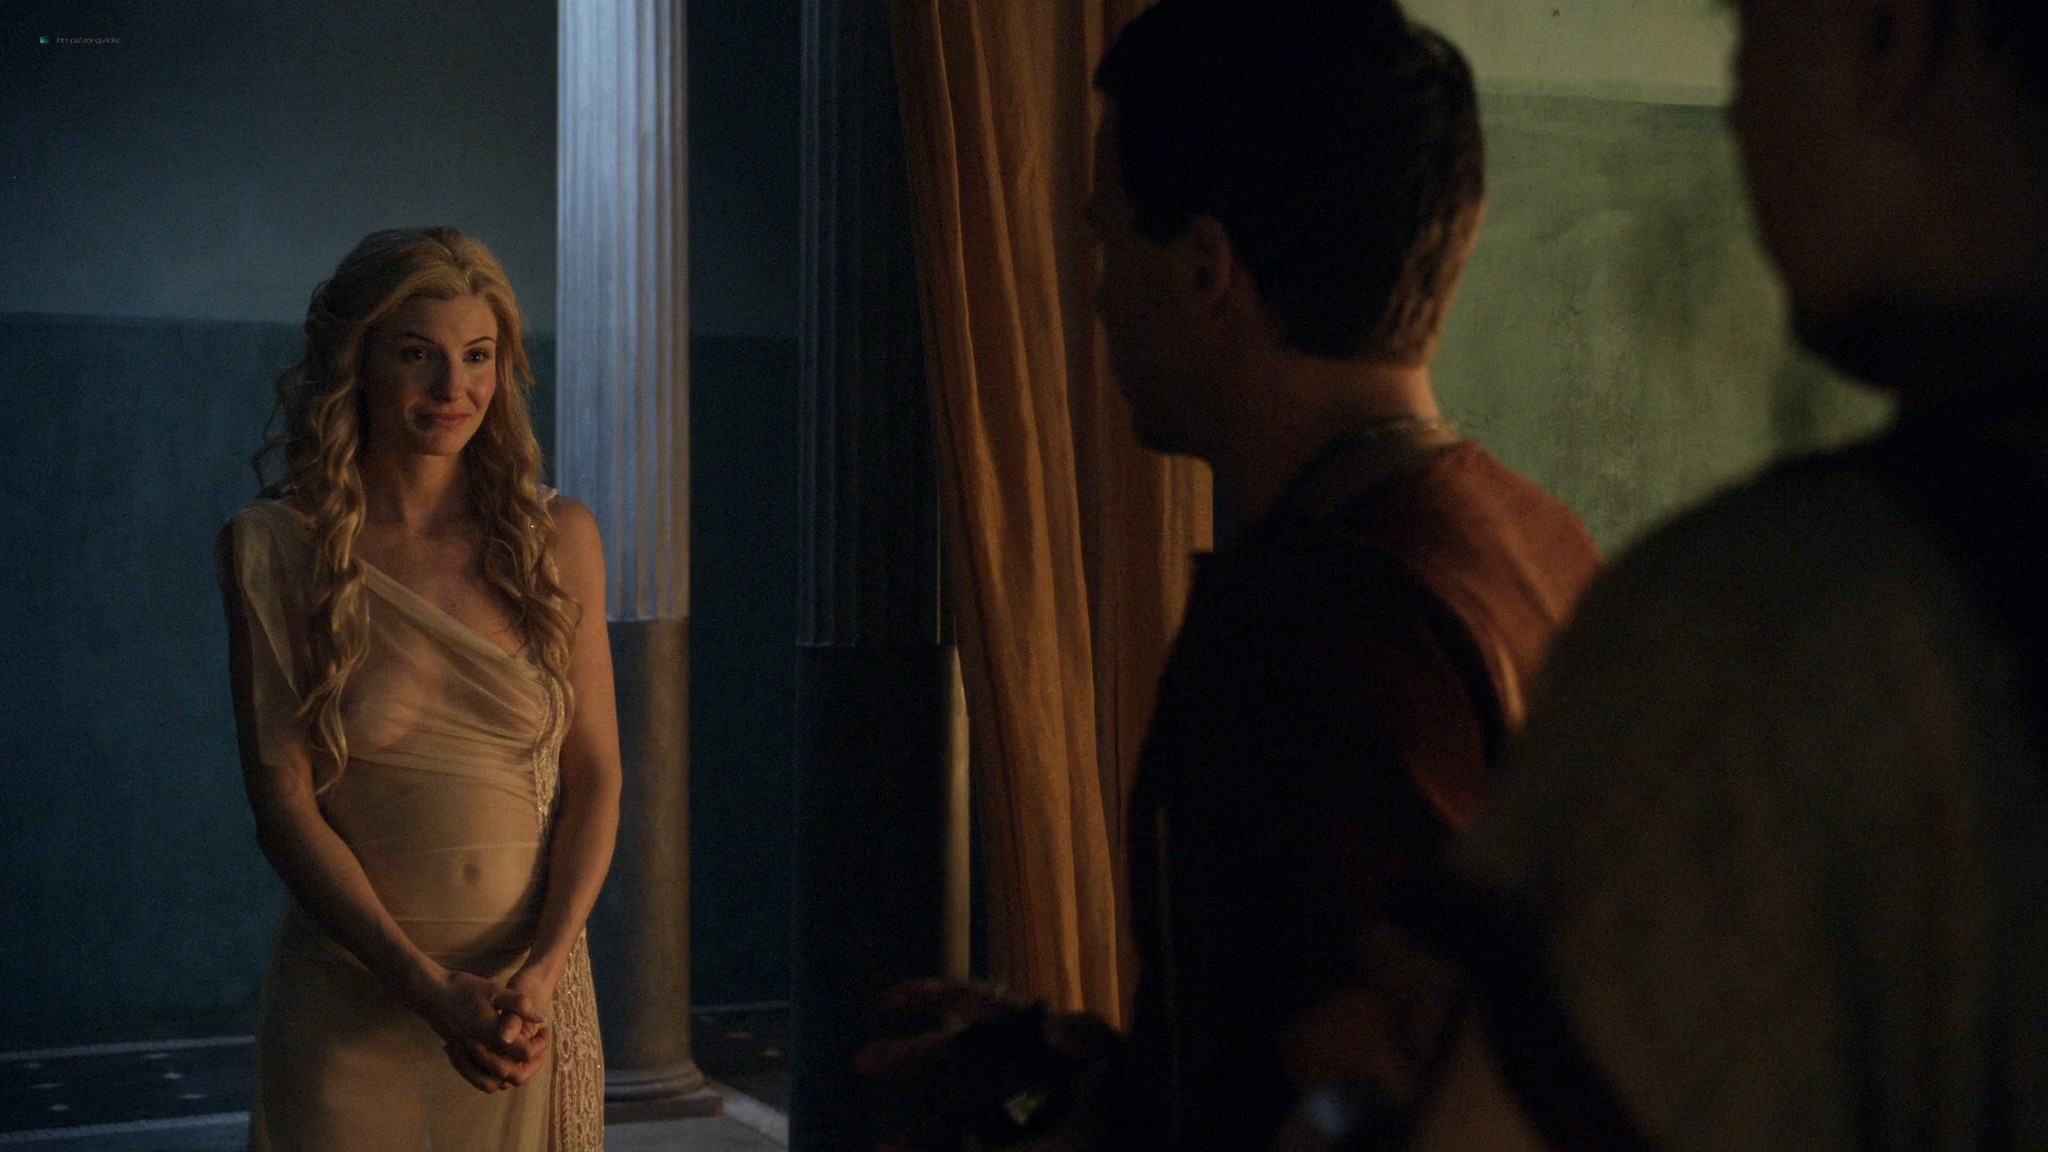 Viva Bianca nude topless Katrina Law, Bonnie Sveen, etc -Spartacus - Vengeance (2012) e3 1080p (15)